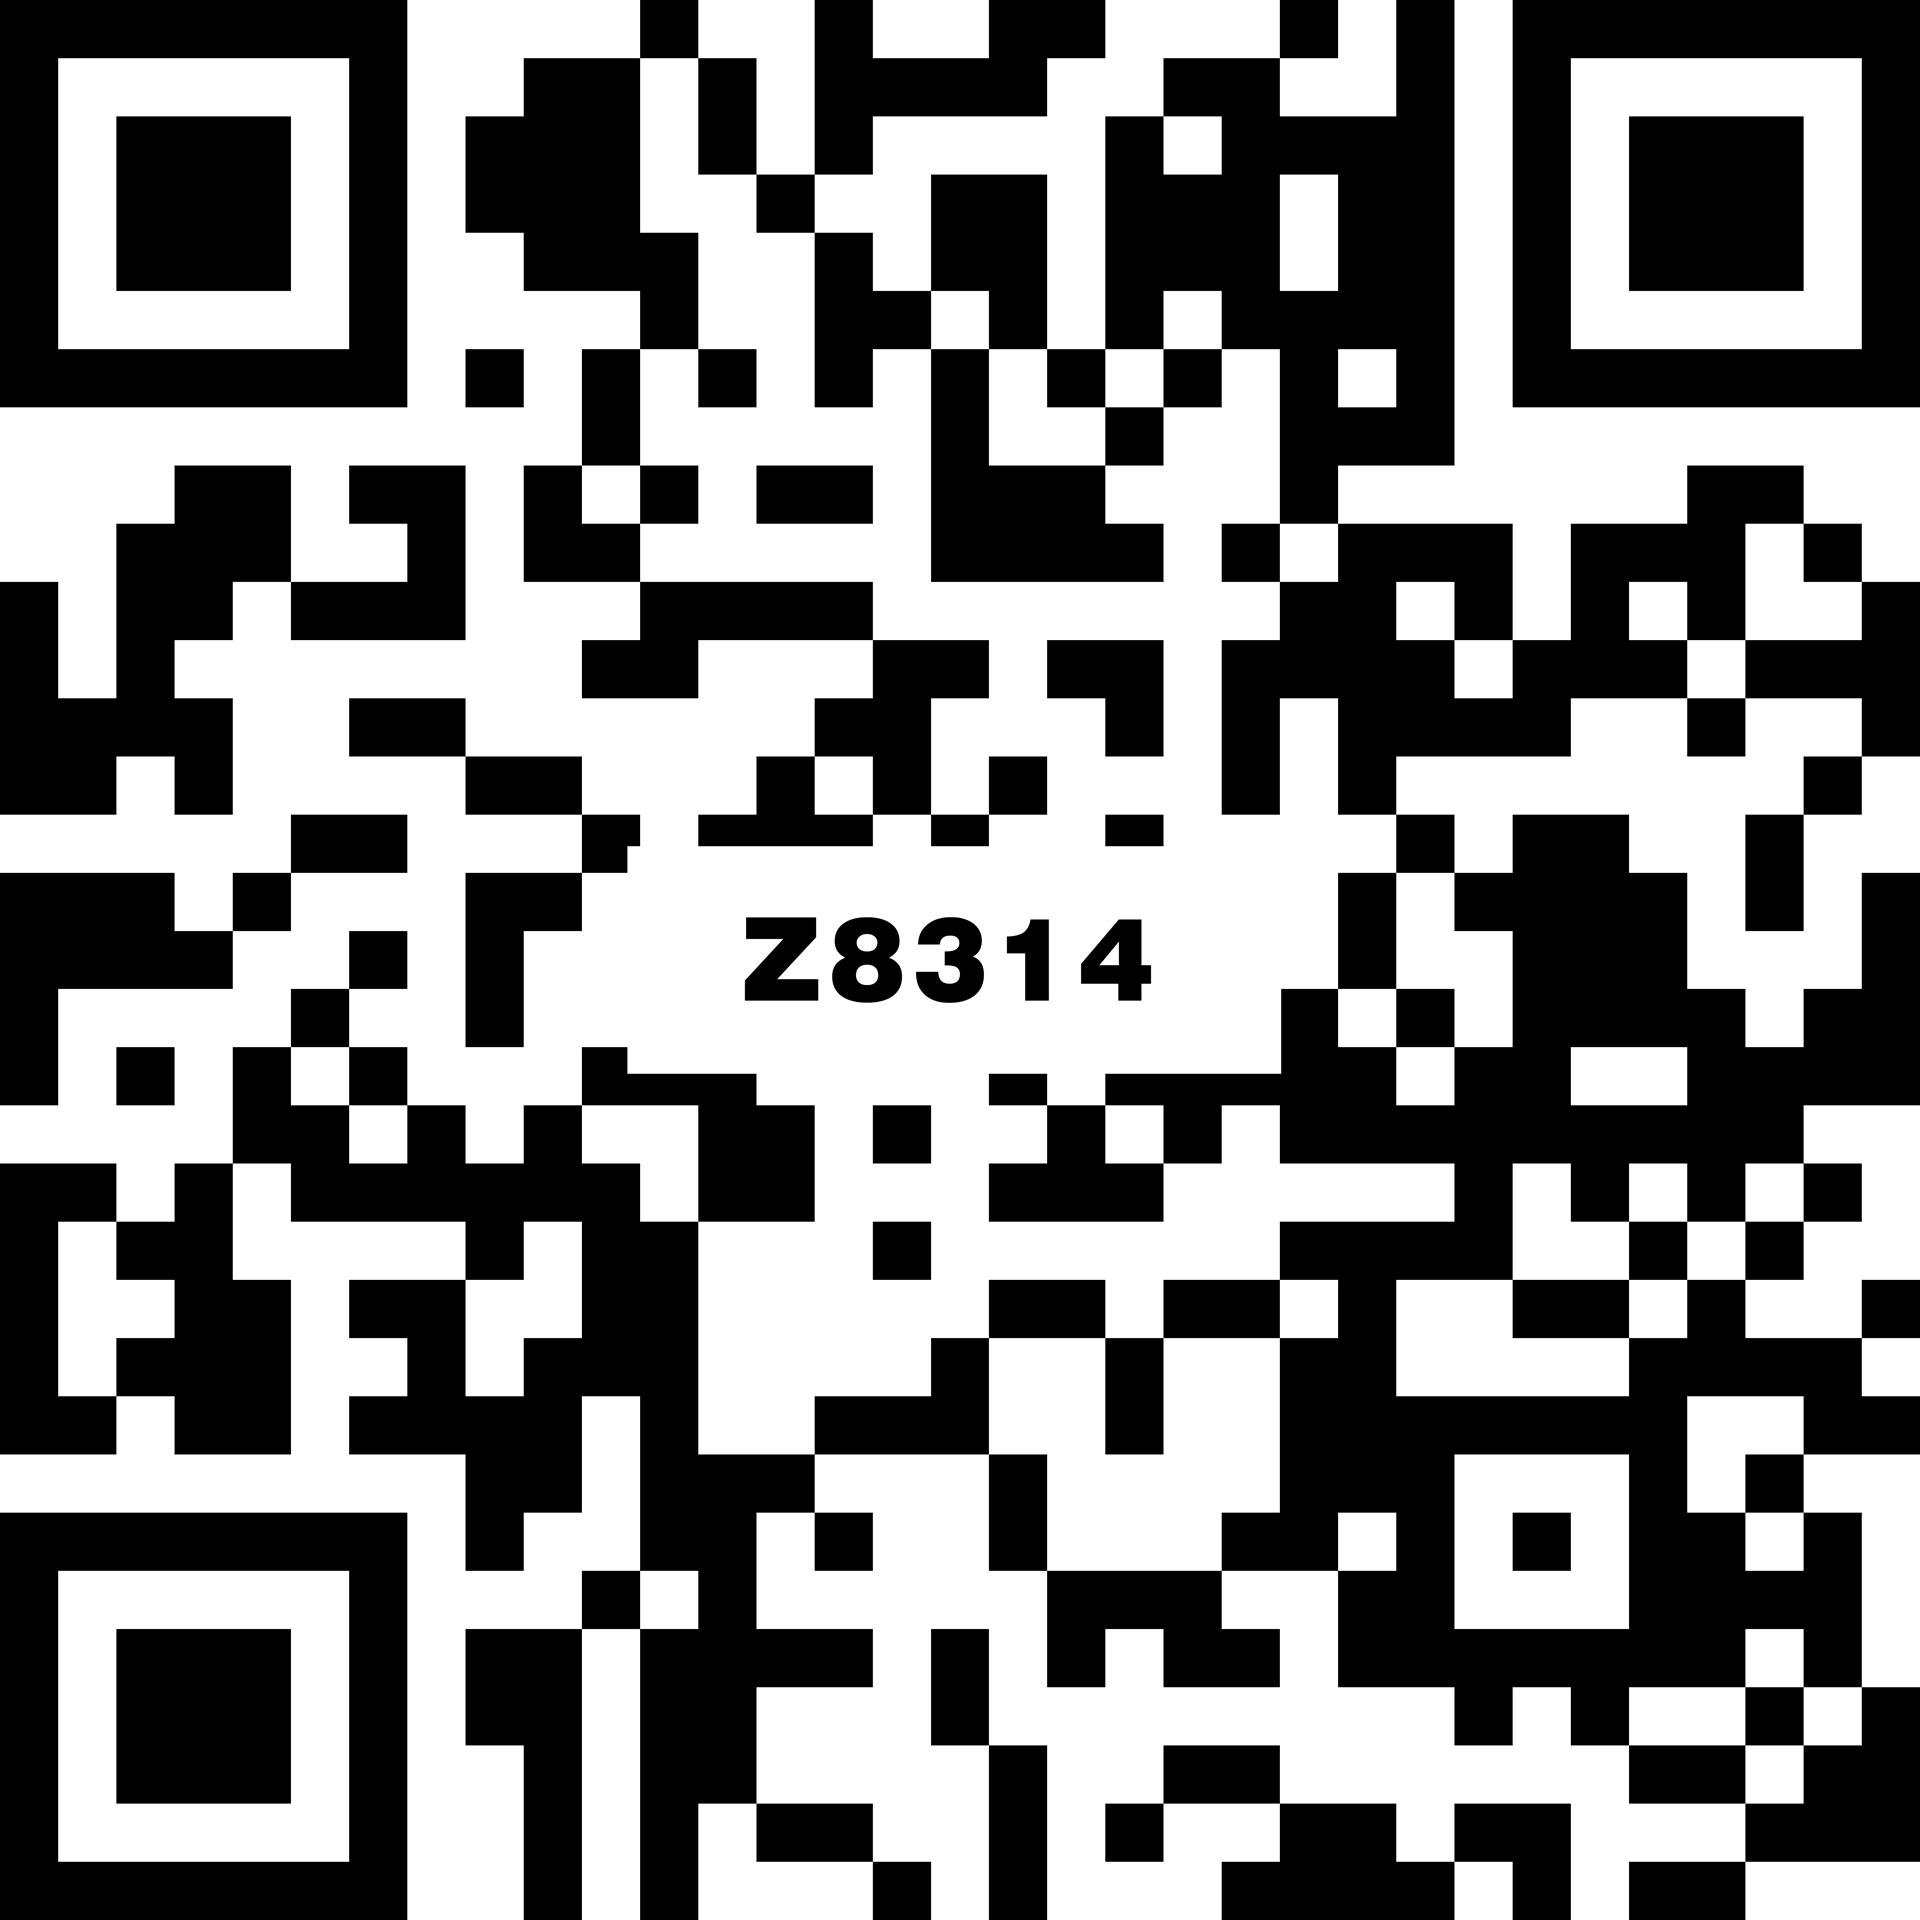 Z8314